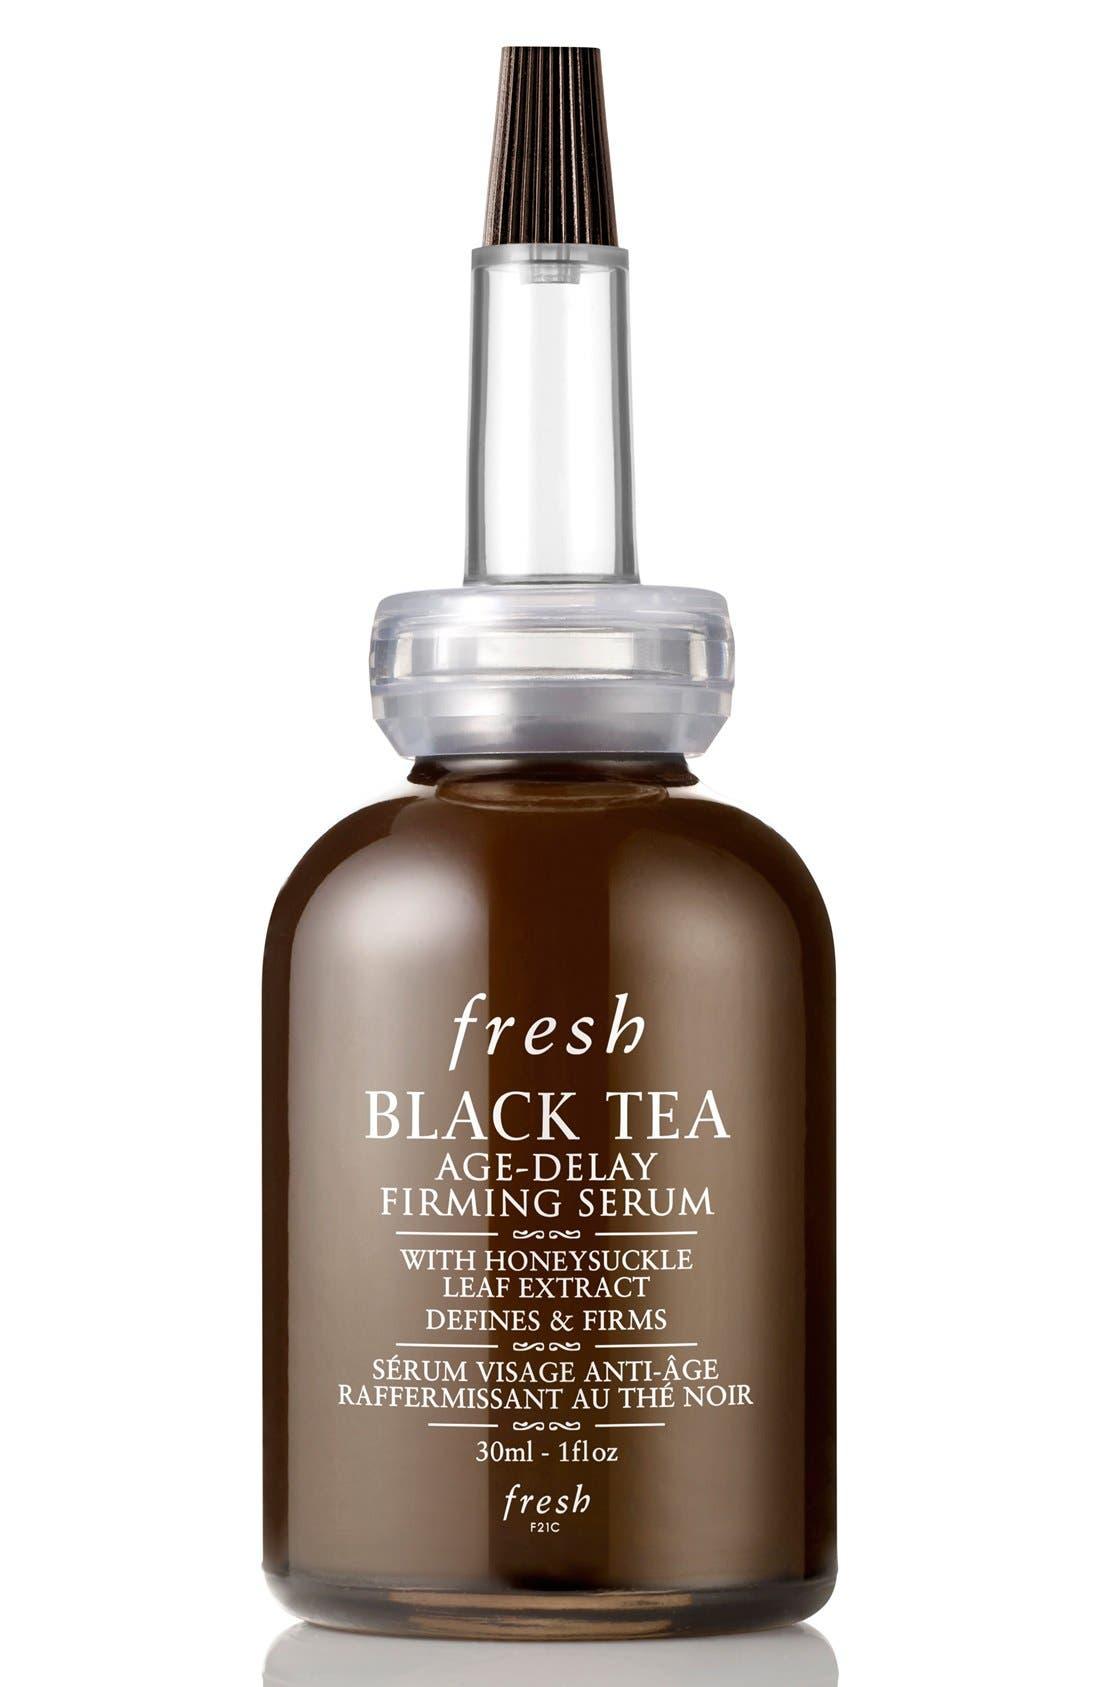 Fresh® Black Tea Age-Delay Firming Serum